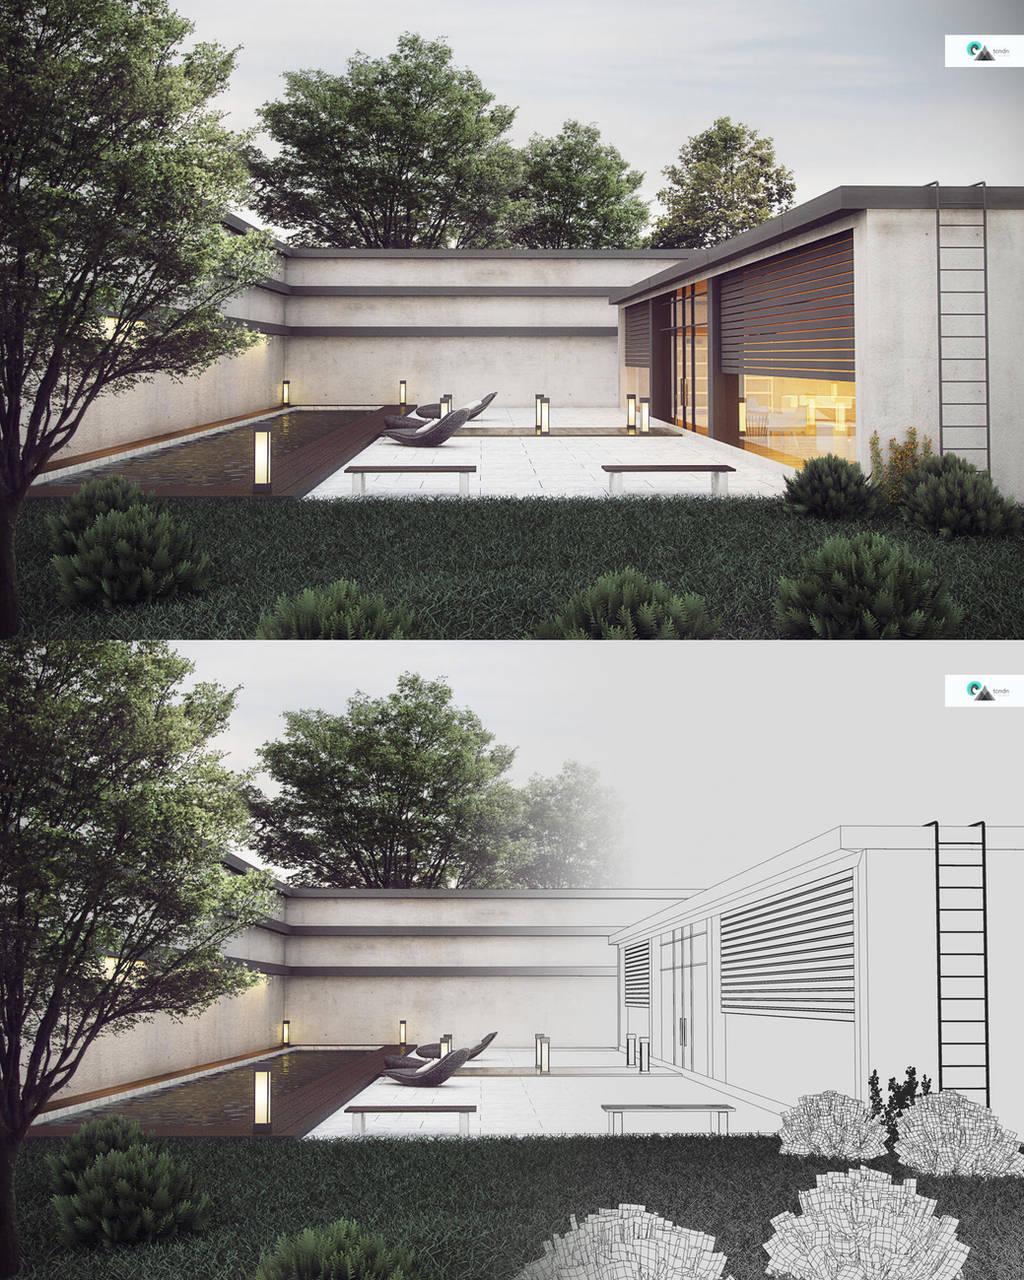 Exterior Architecture v1 by kornny